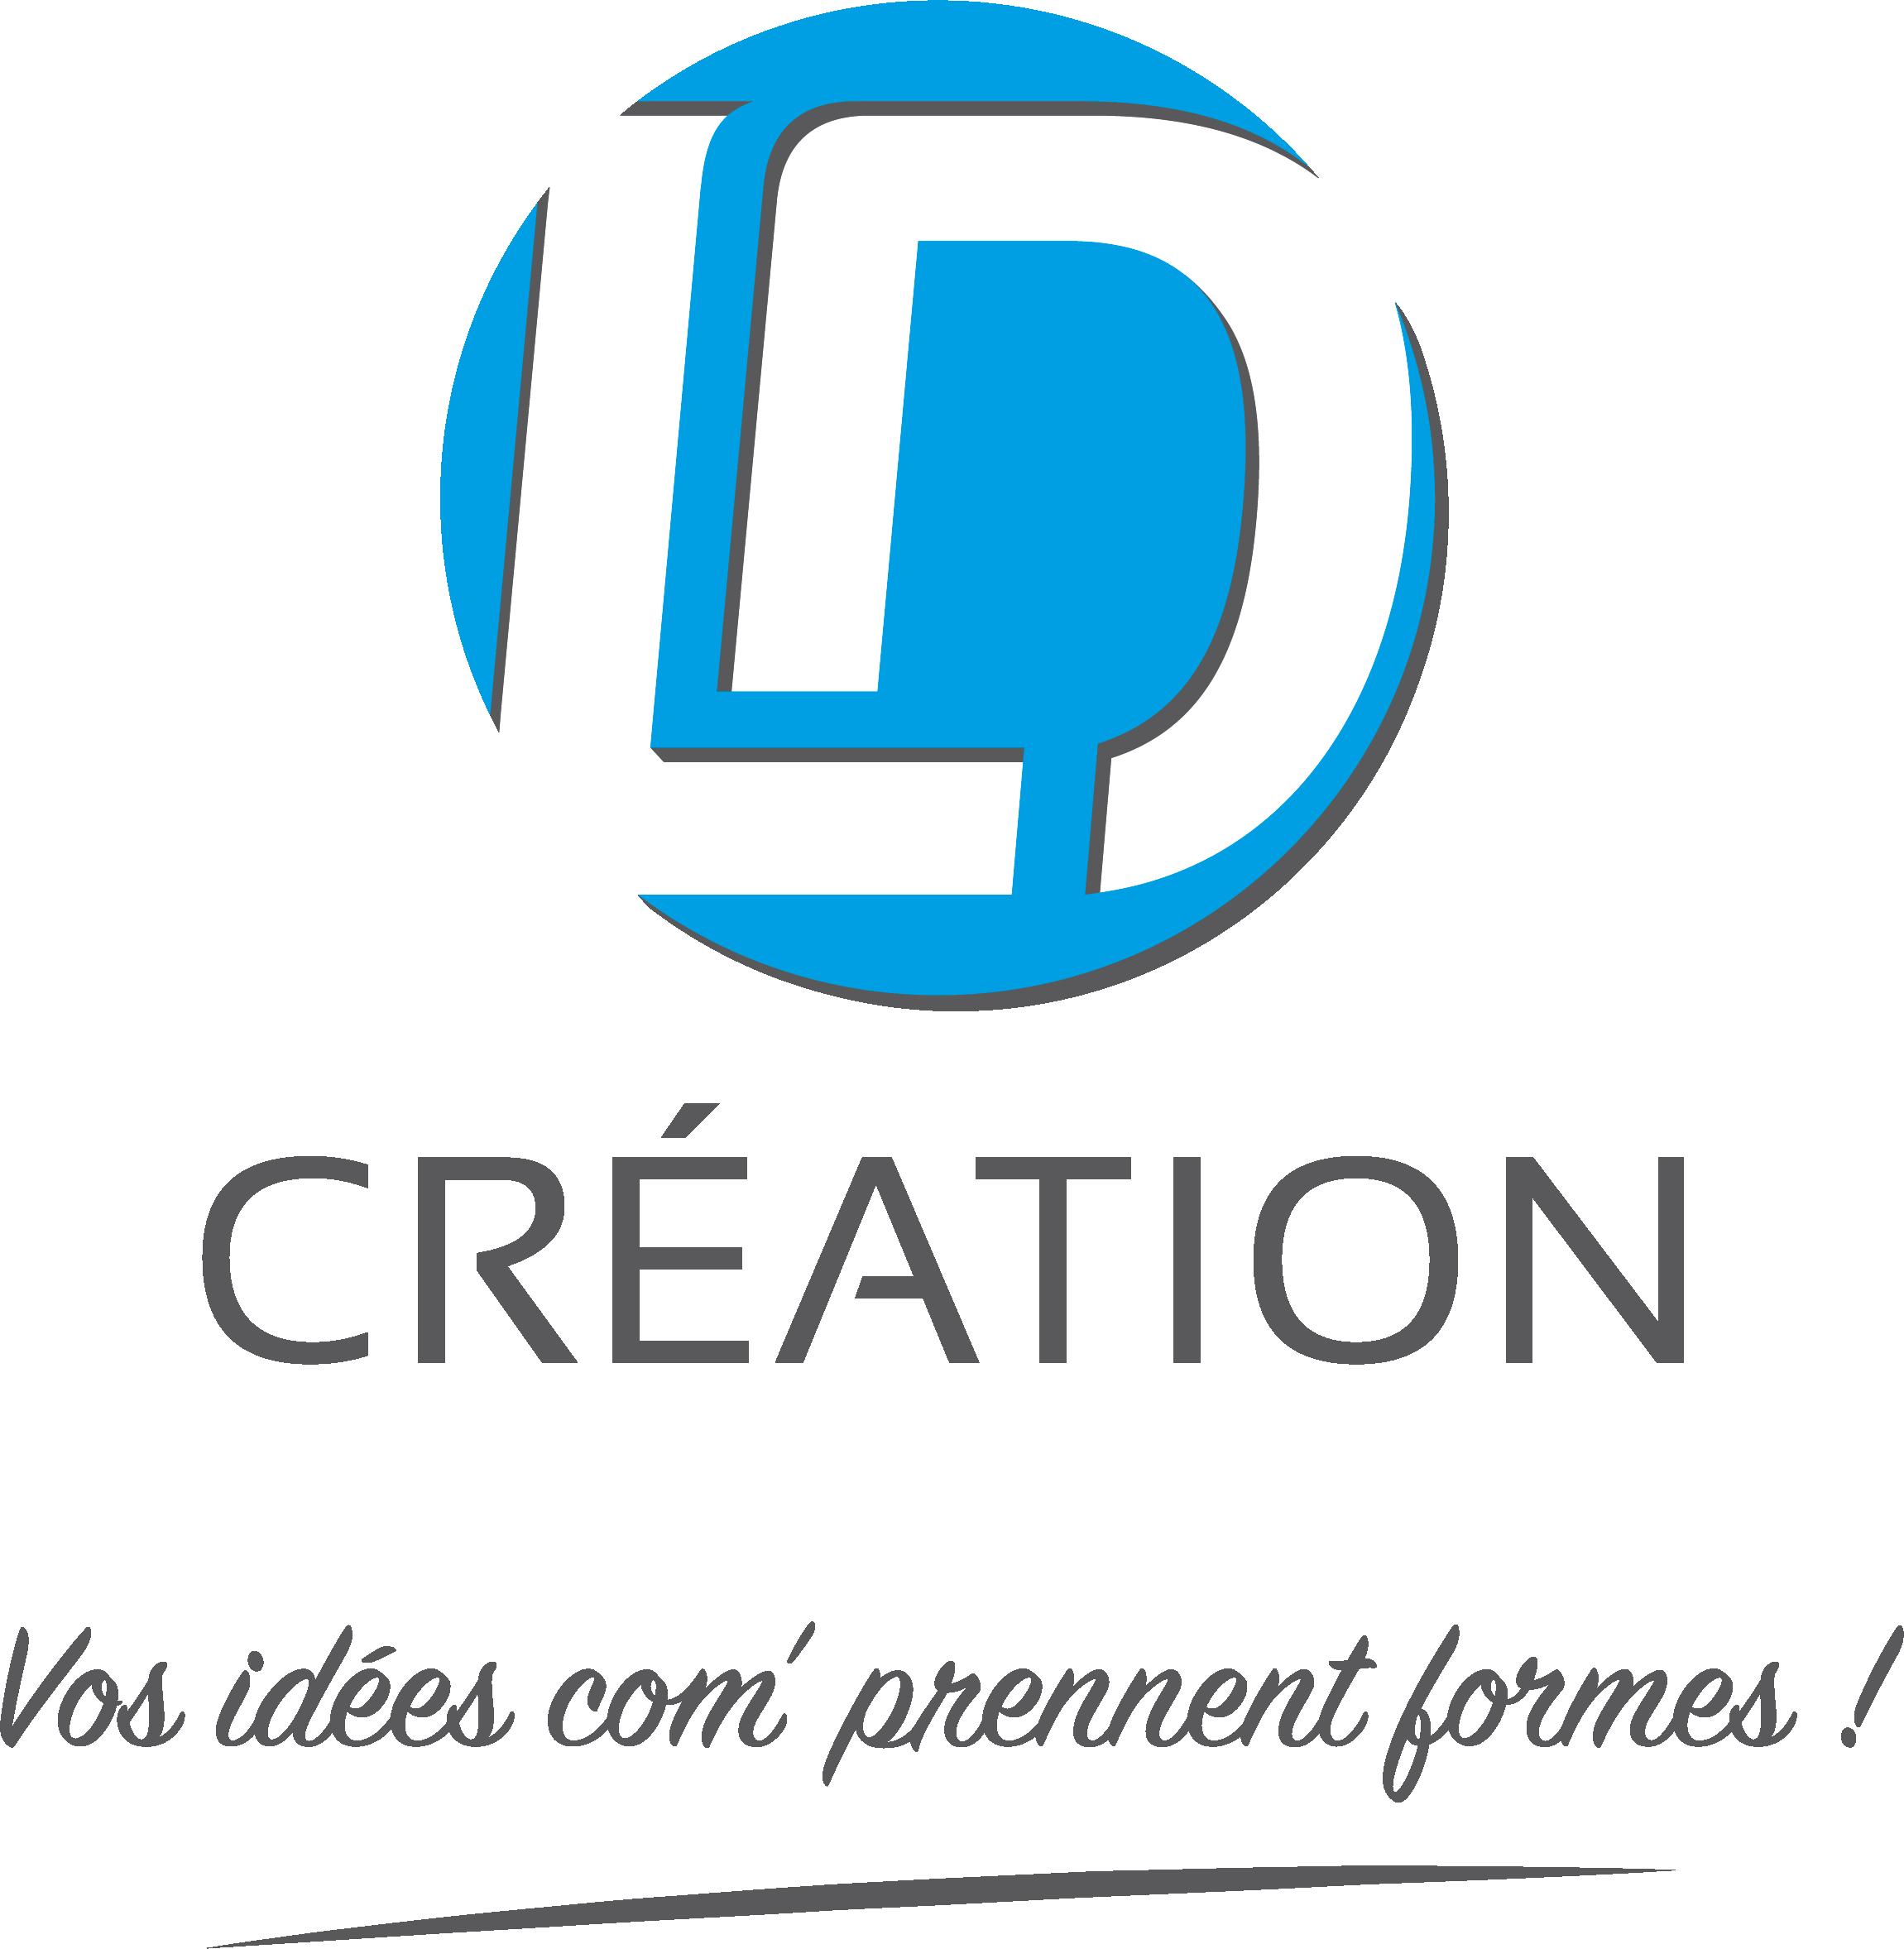 LOGO_LD_CREATION_BASELINE.png